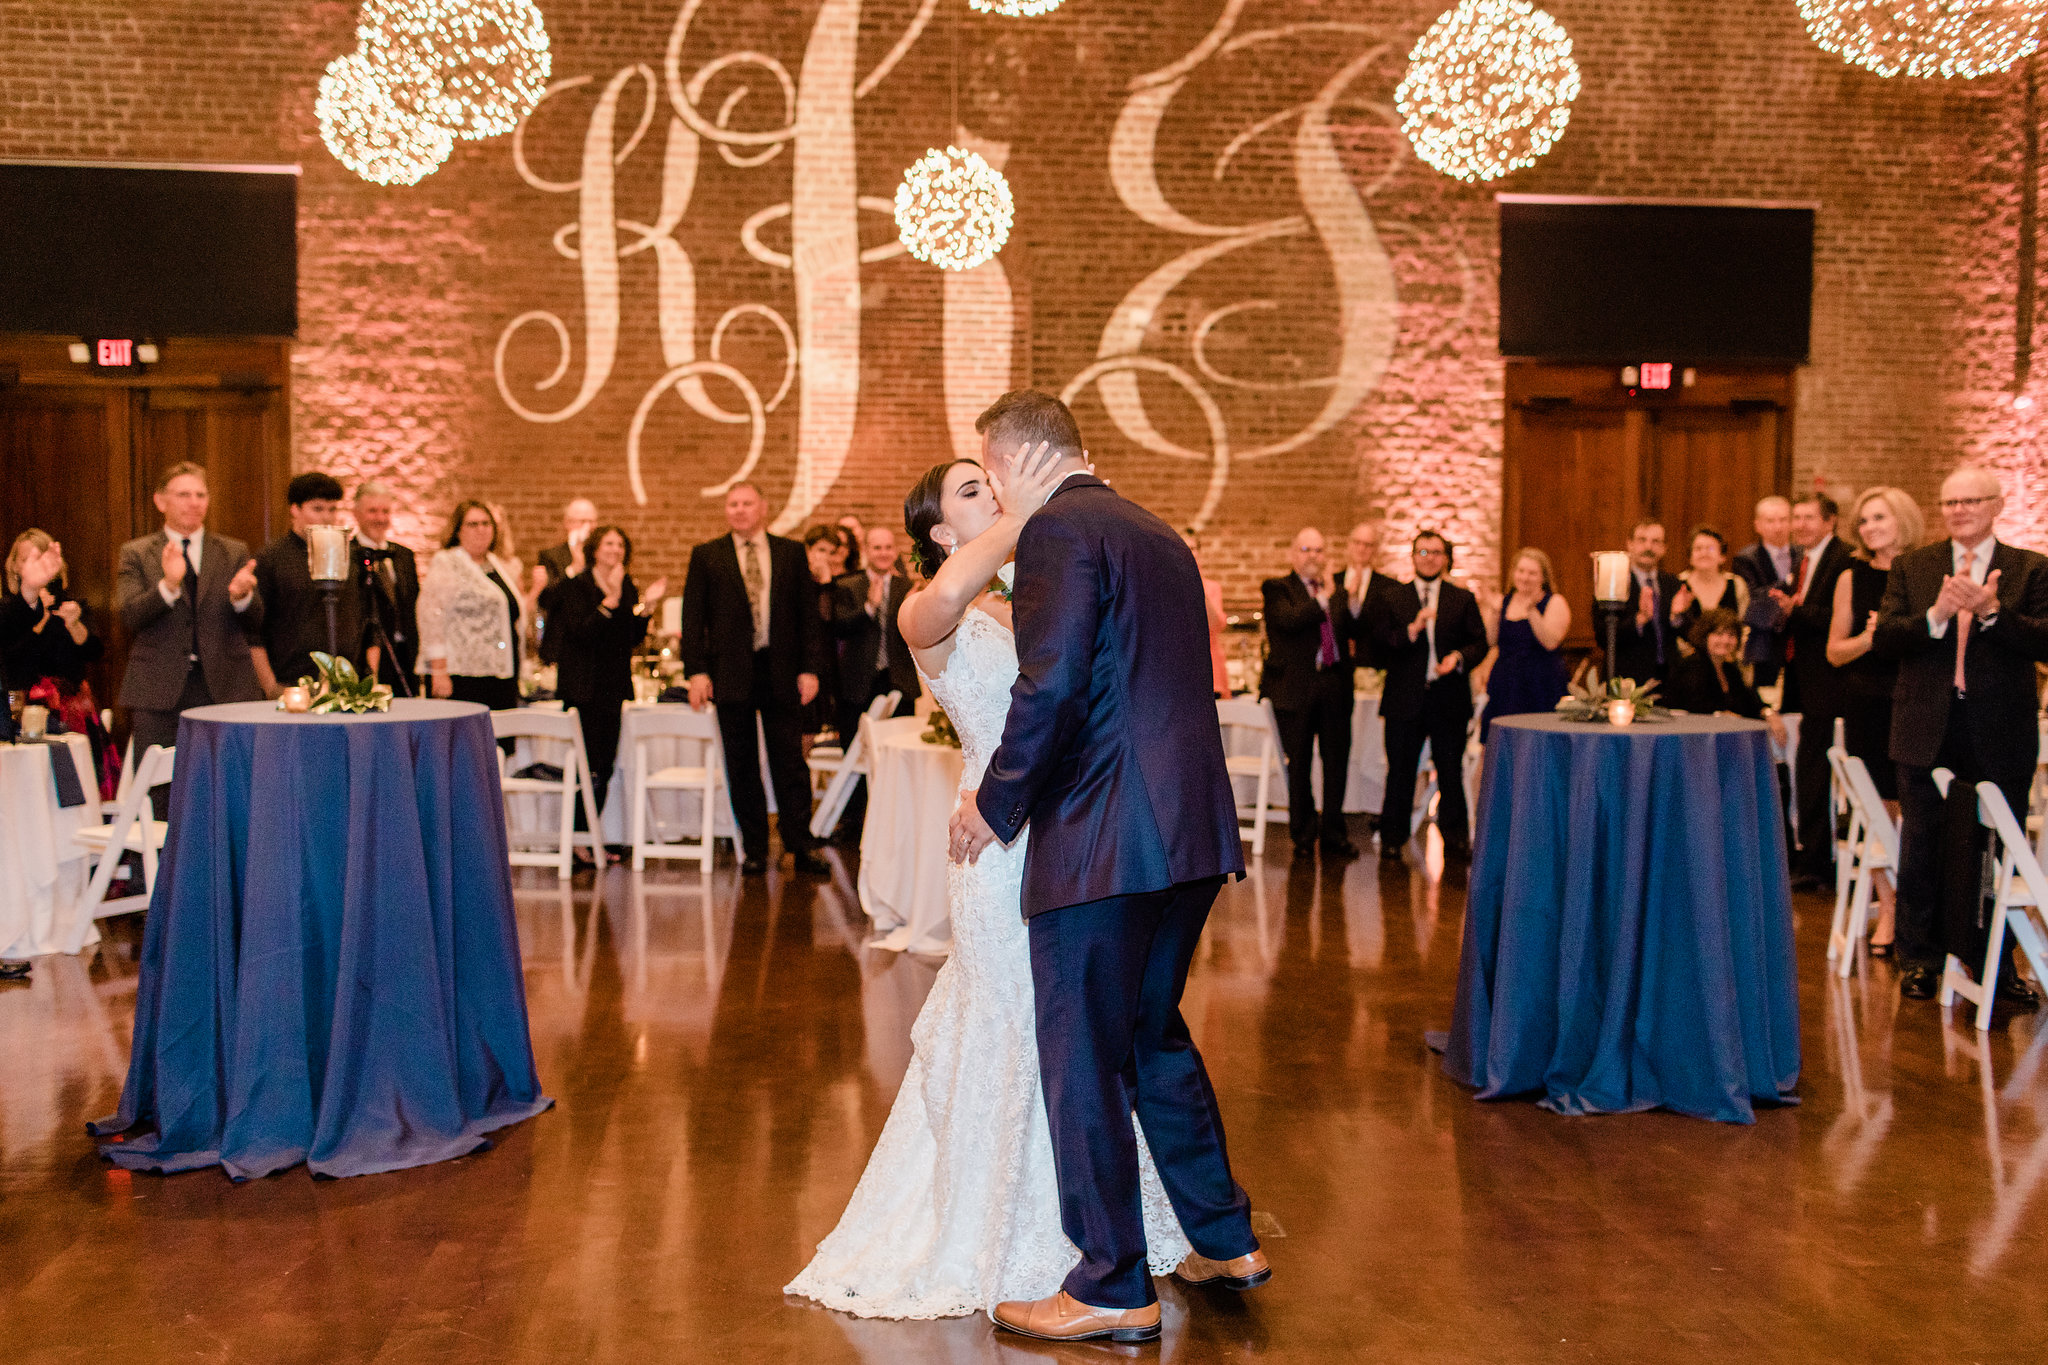 apt-b-photography-Savannah-wedding-photographer-savannah-engagement-photographer-historic-savannah-engagement-charles-h-morris-center-wedding-savannah-weddings-46.JPG